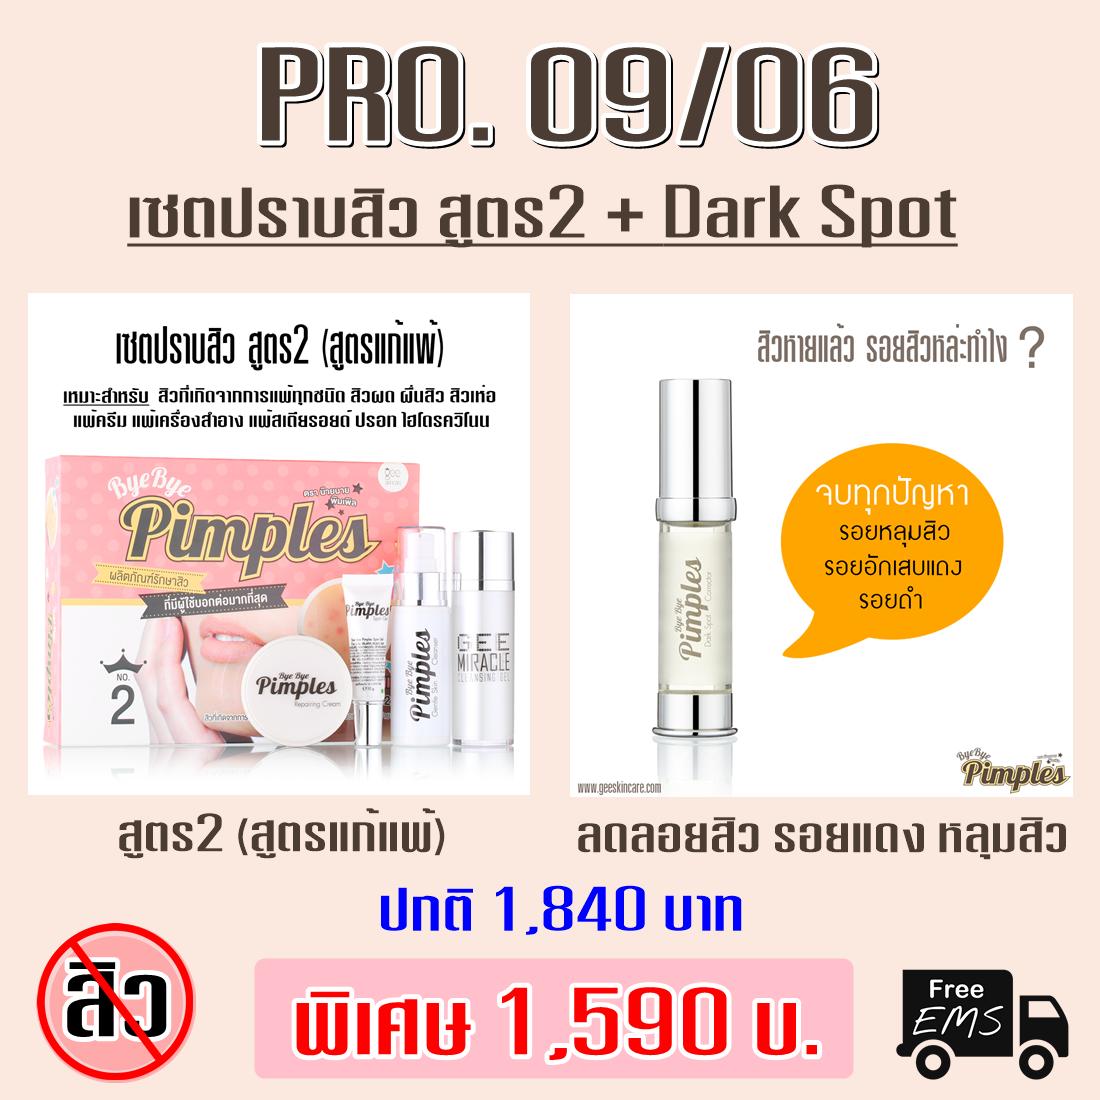 Promotion 09/06 [เซตปราบสิว สูตร2(สูตรแก้แพ้) + ซีรั่มลดรอยสิว(Dark Spot Corrector)]